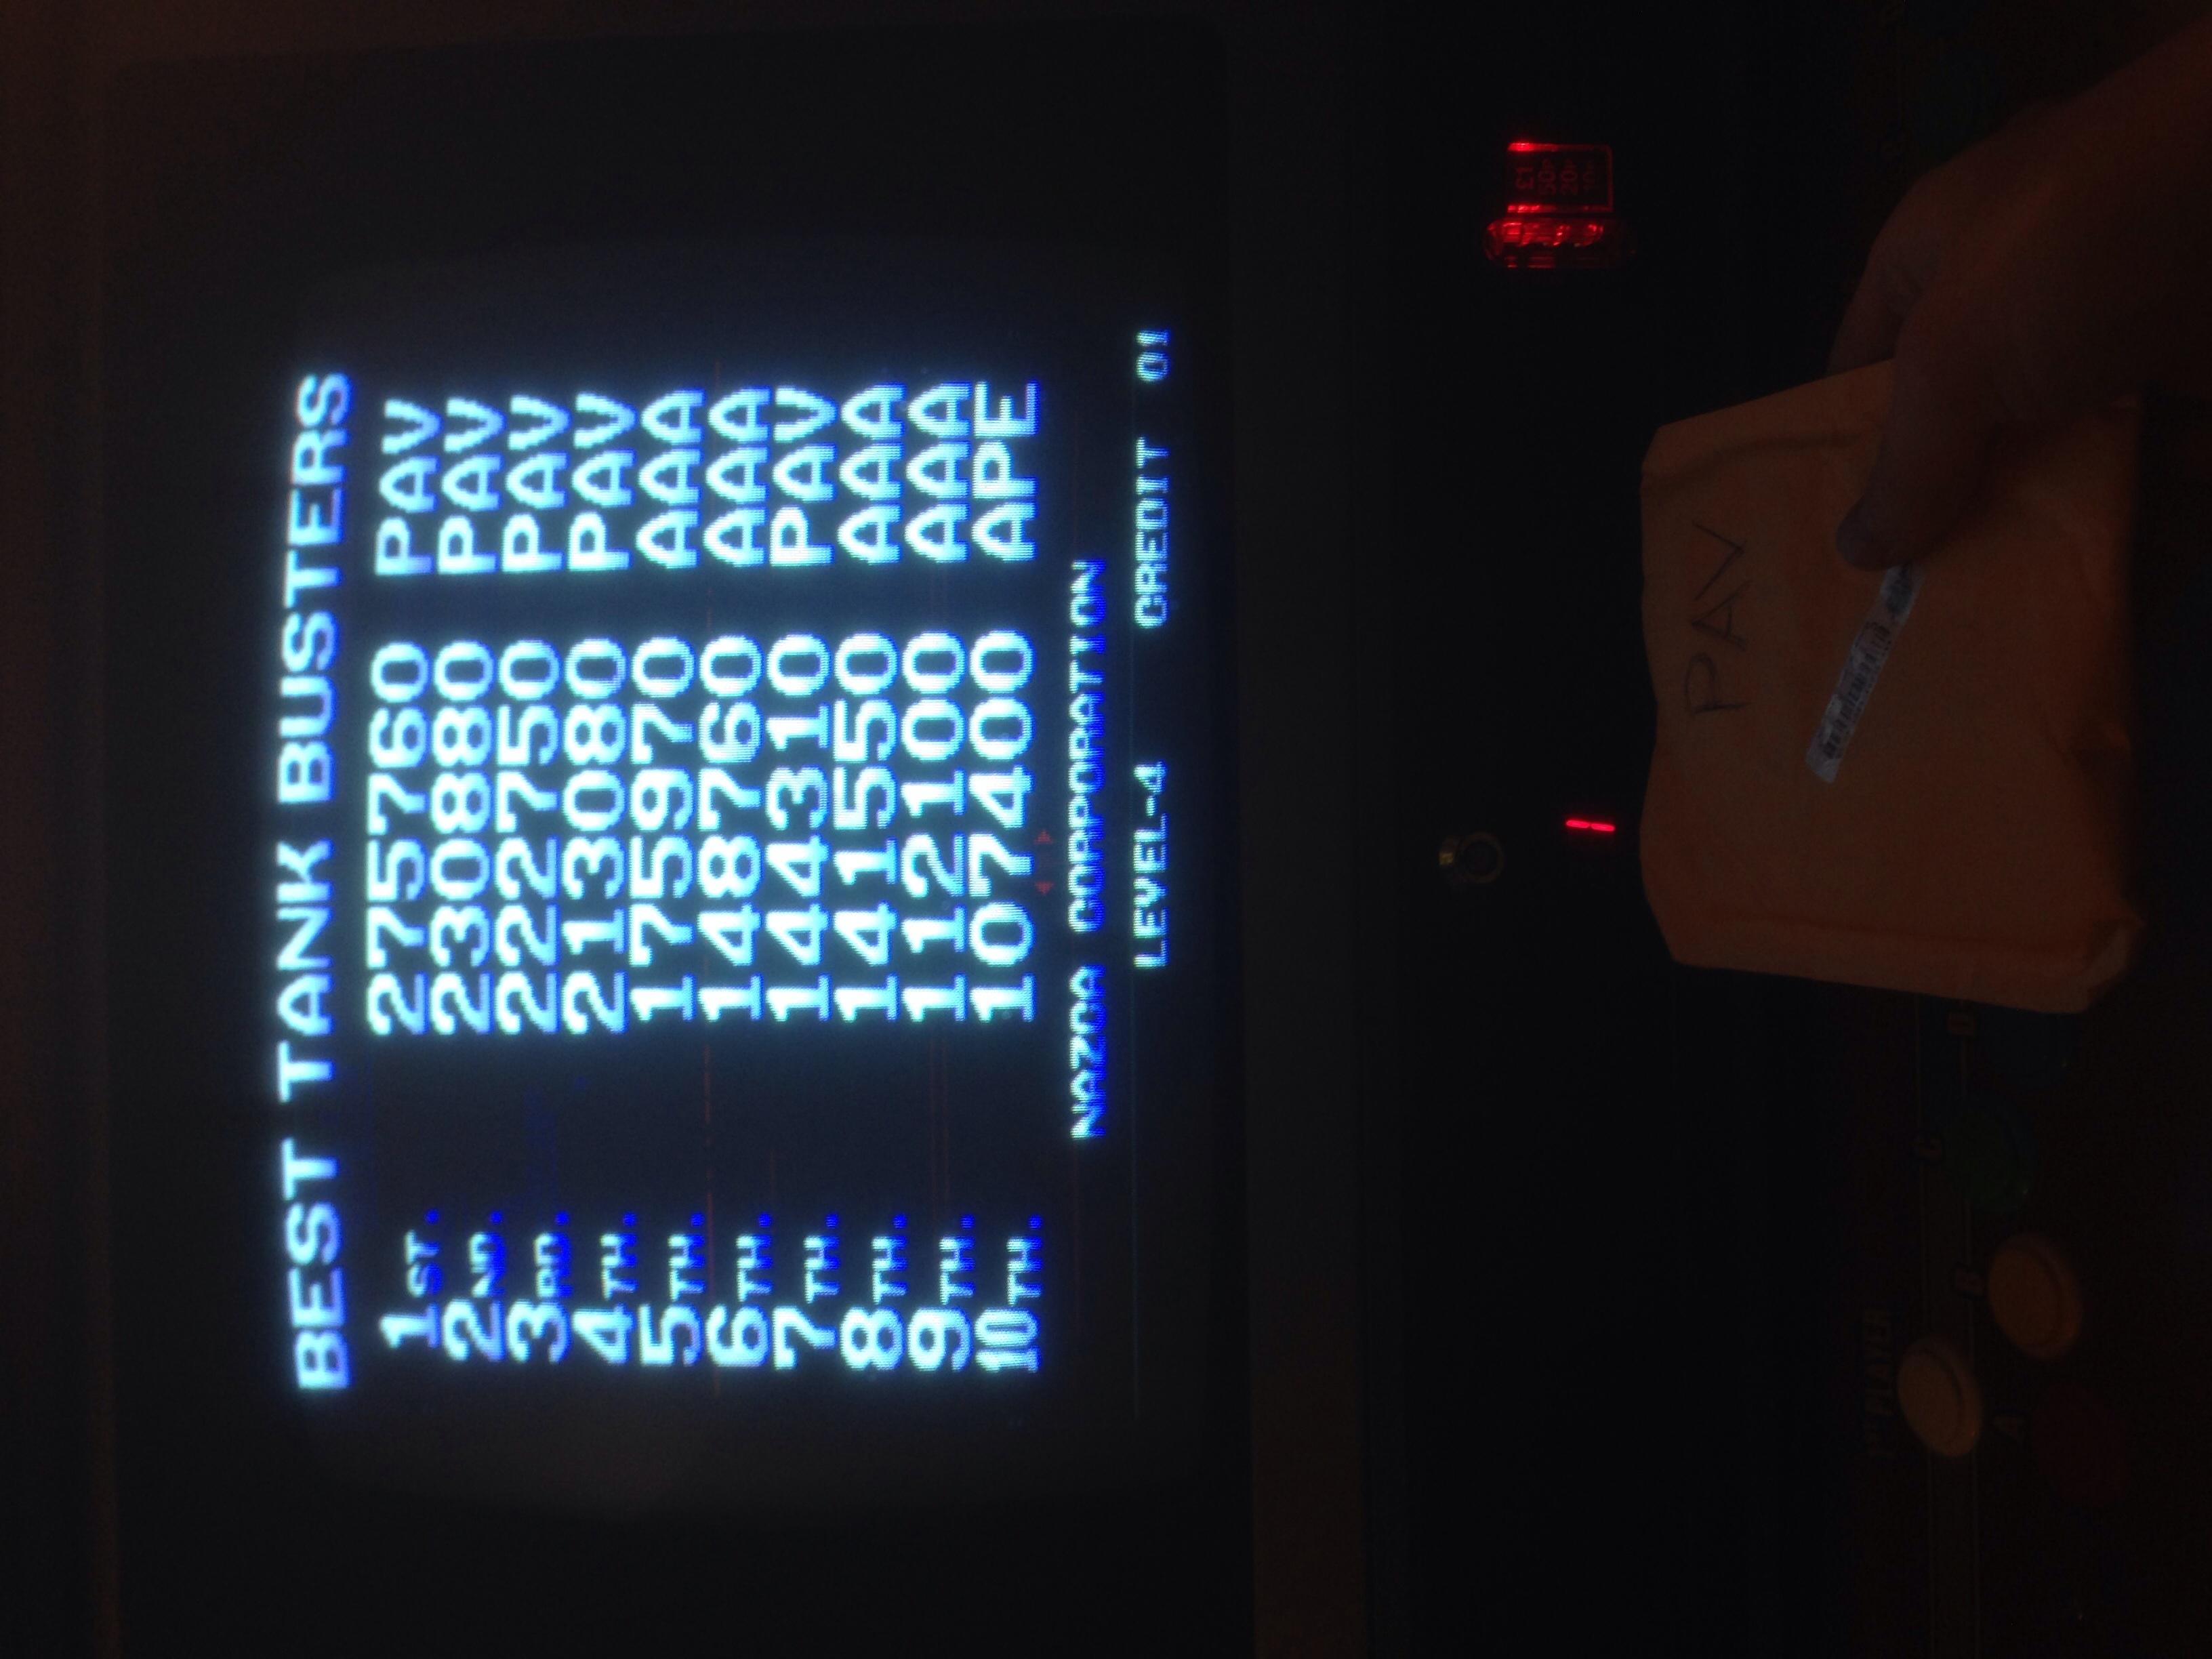 phillv85: Metal Slug (Arcade) 275,760 points on 2015-06-02 15:47:01